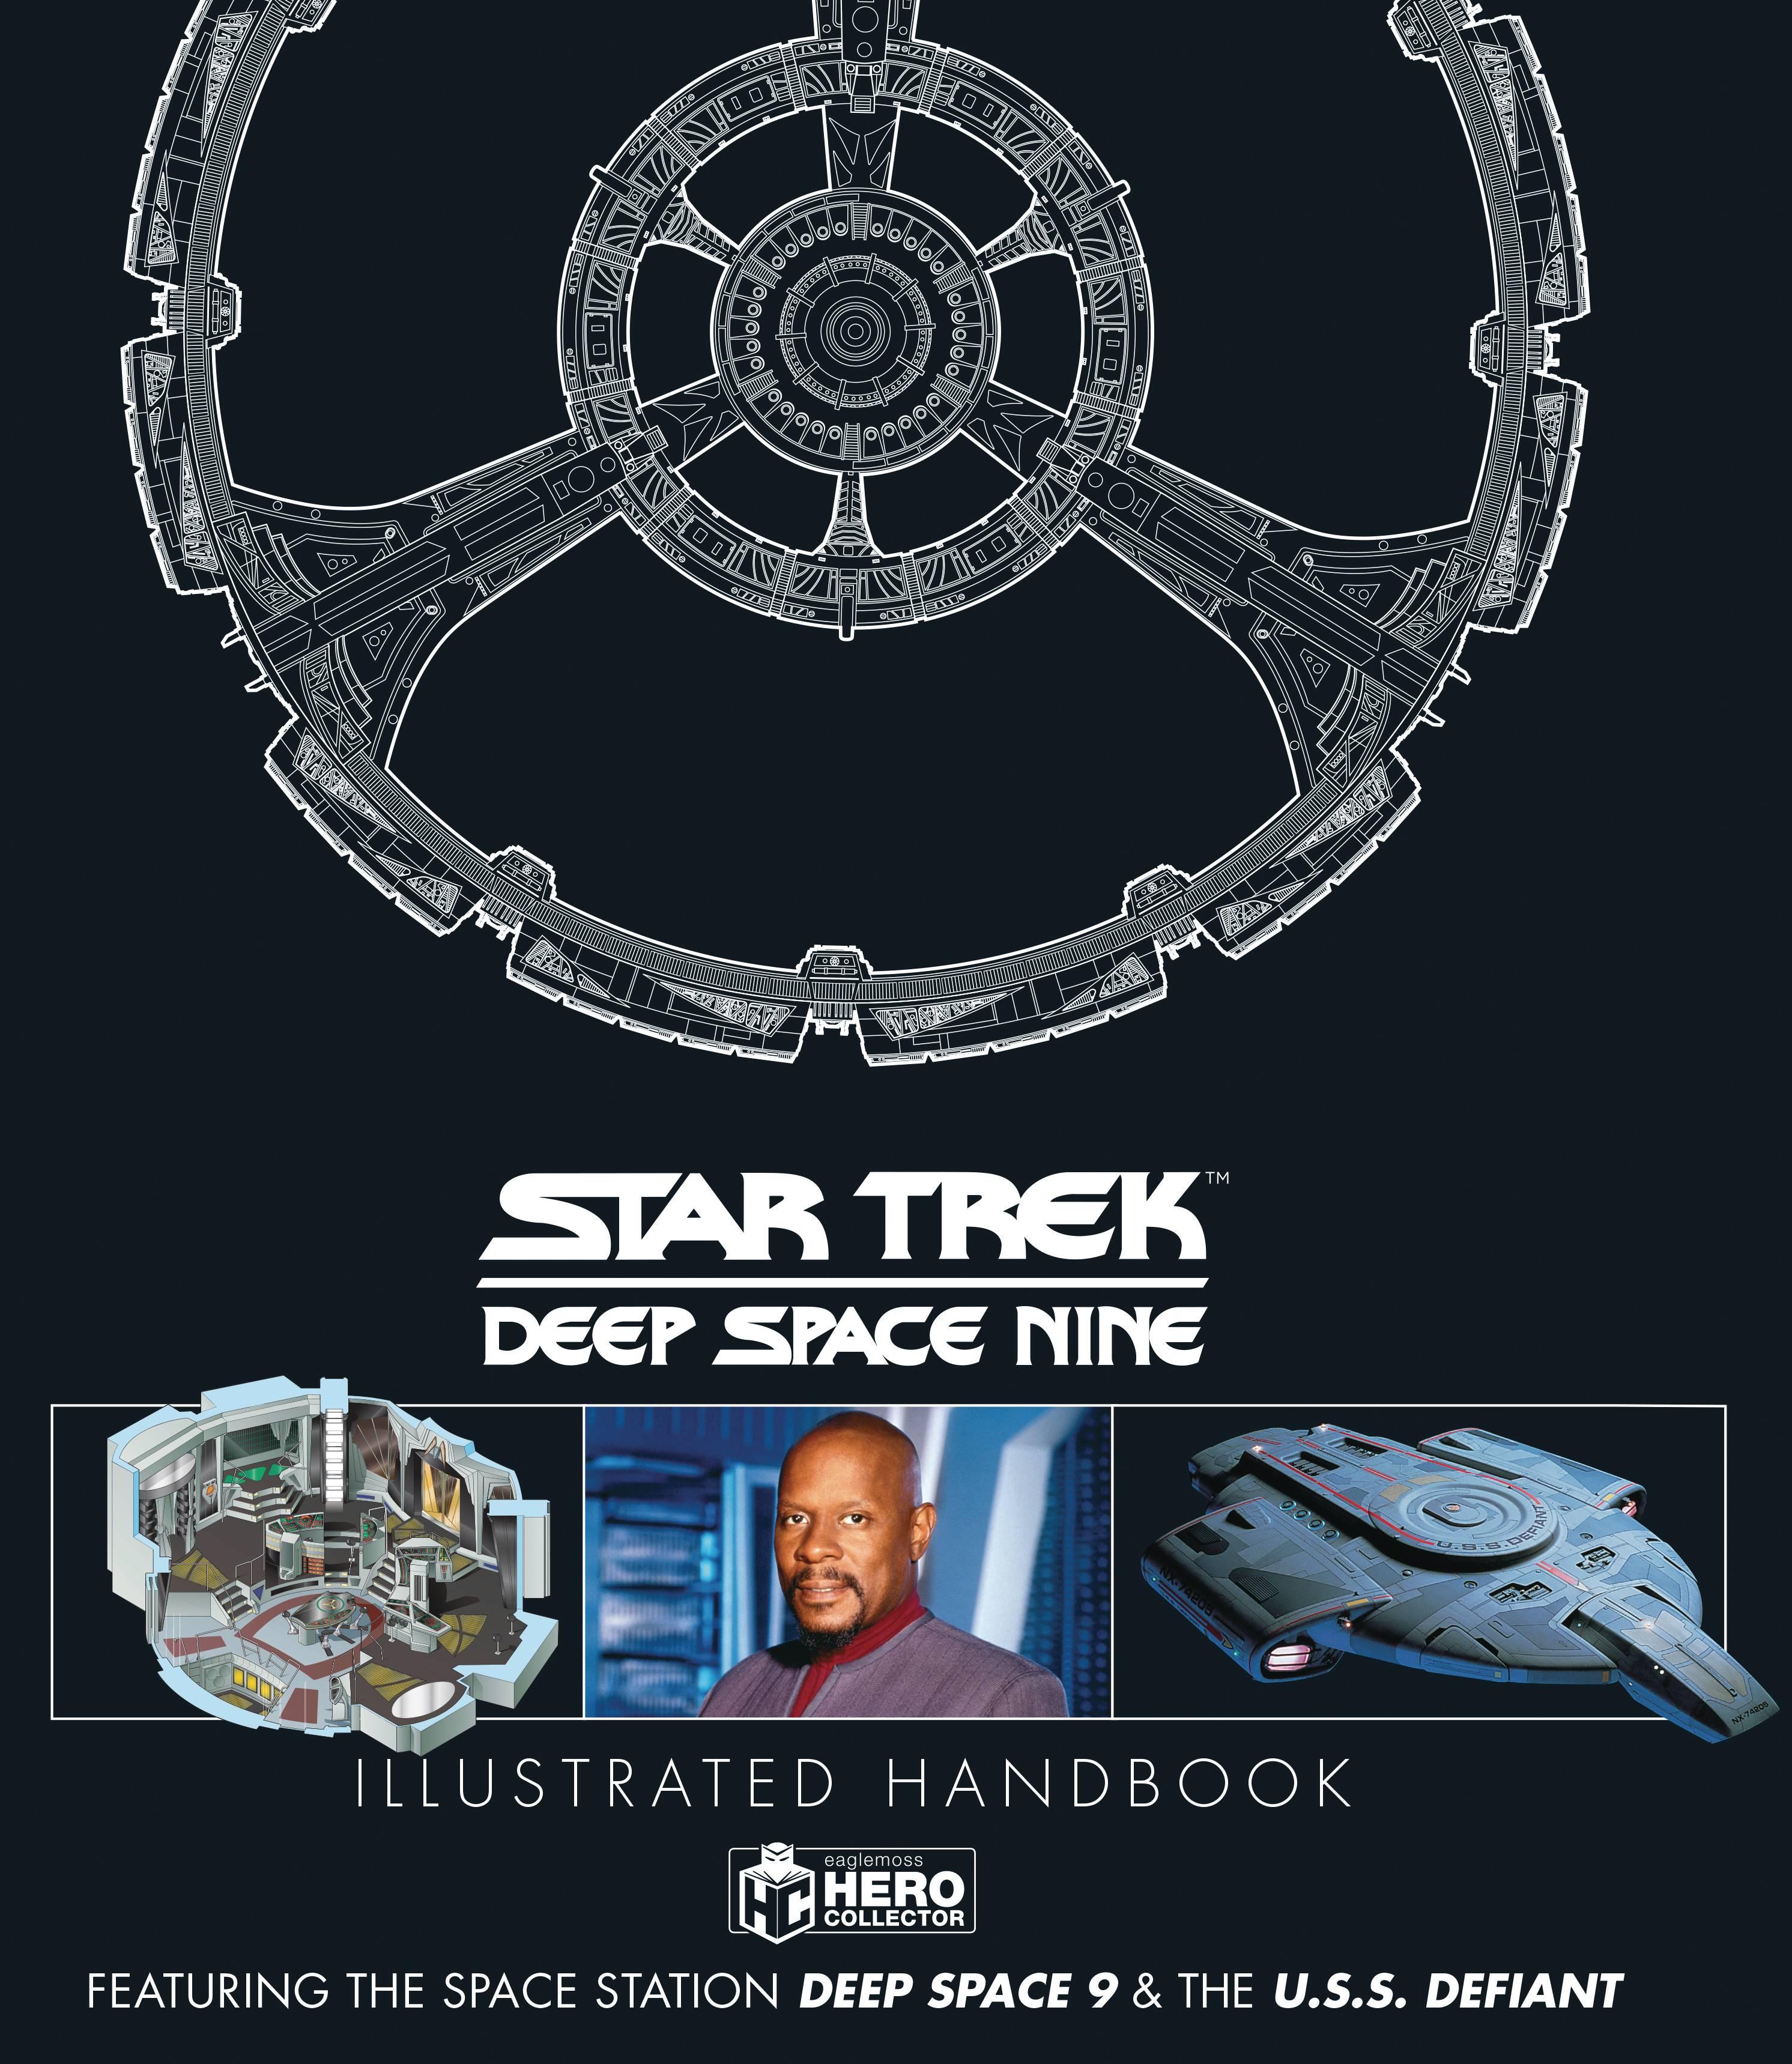 STAR TREK DS9 & USS DEFIANT ILLUS HANDBOOK HC